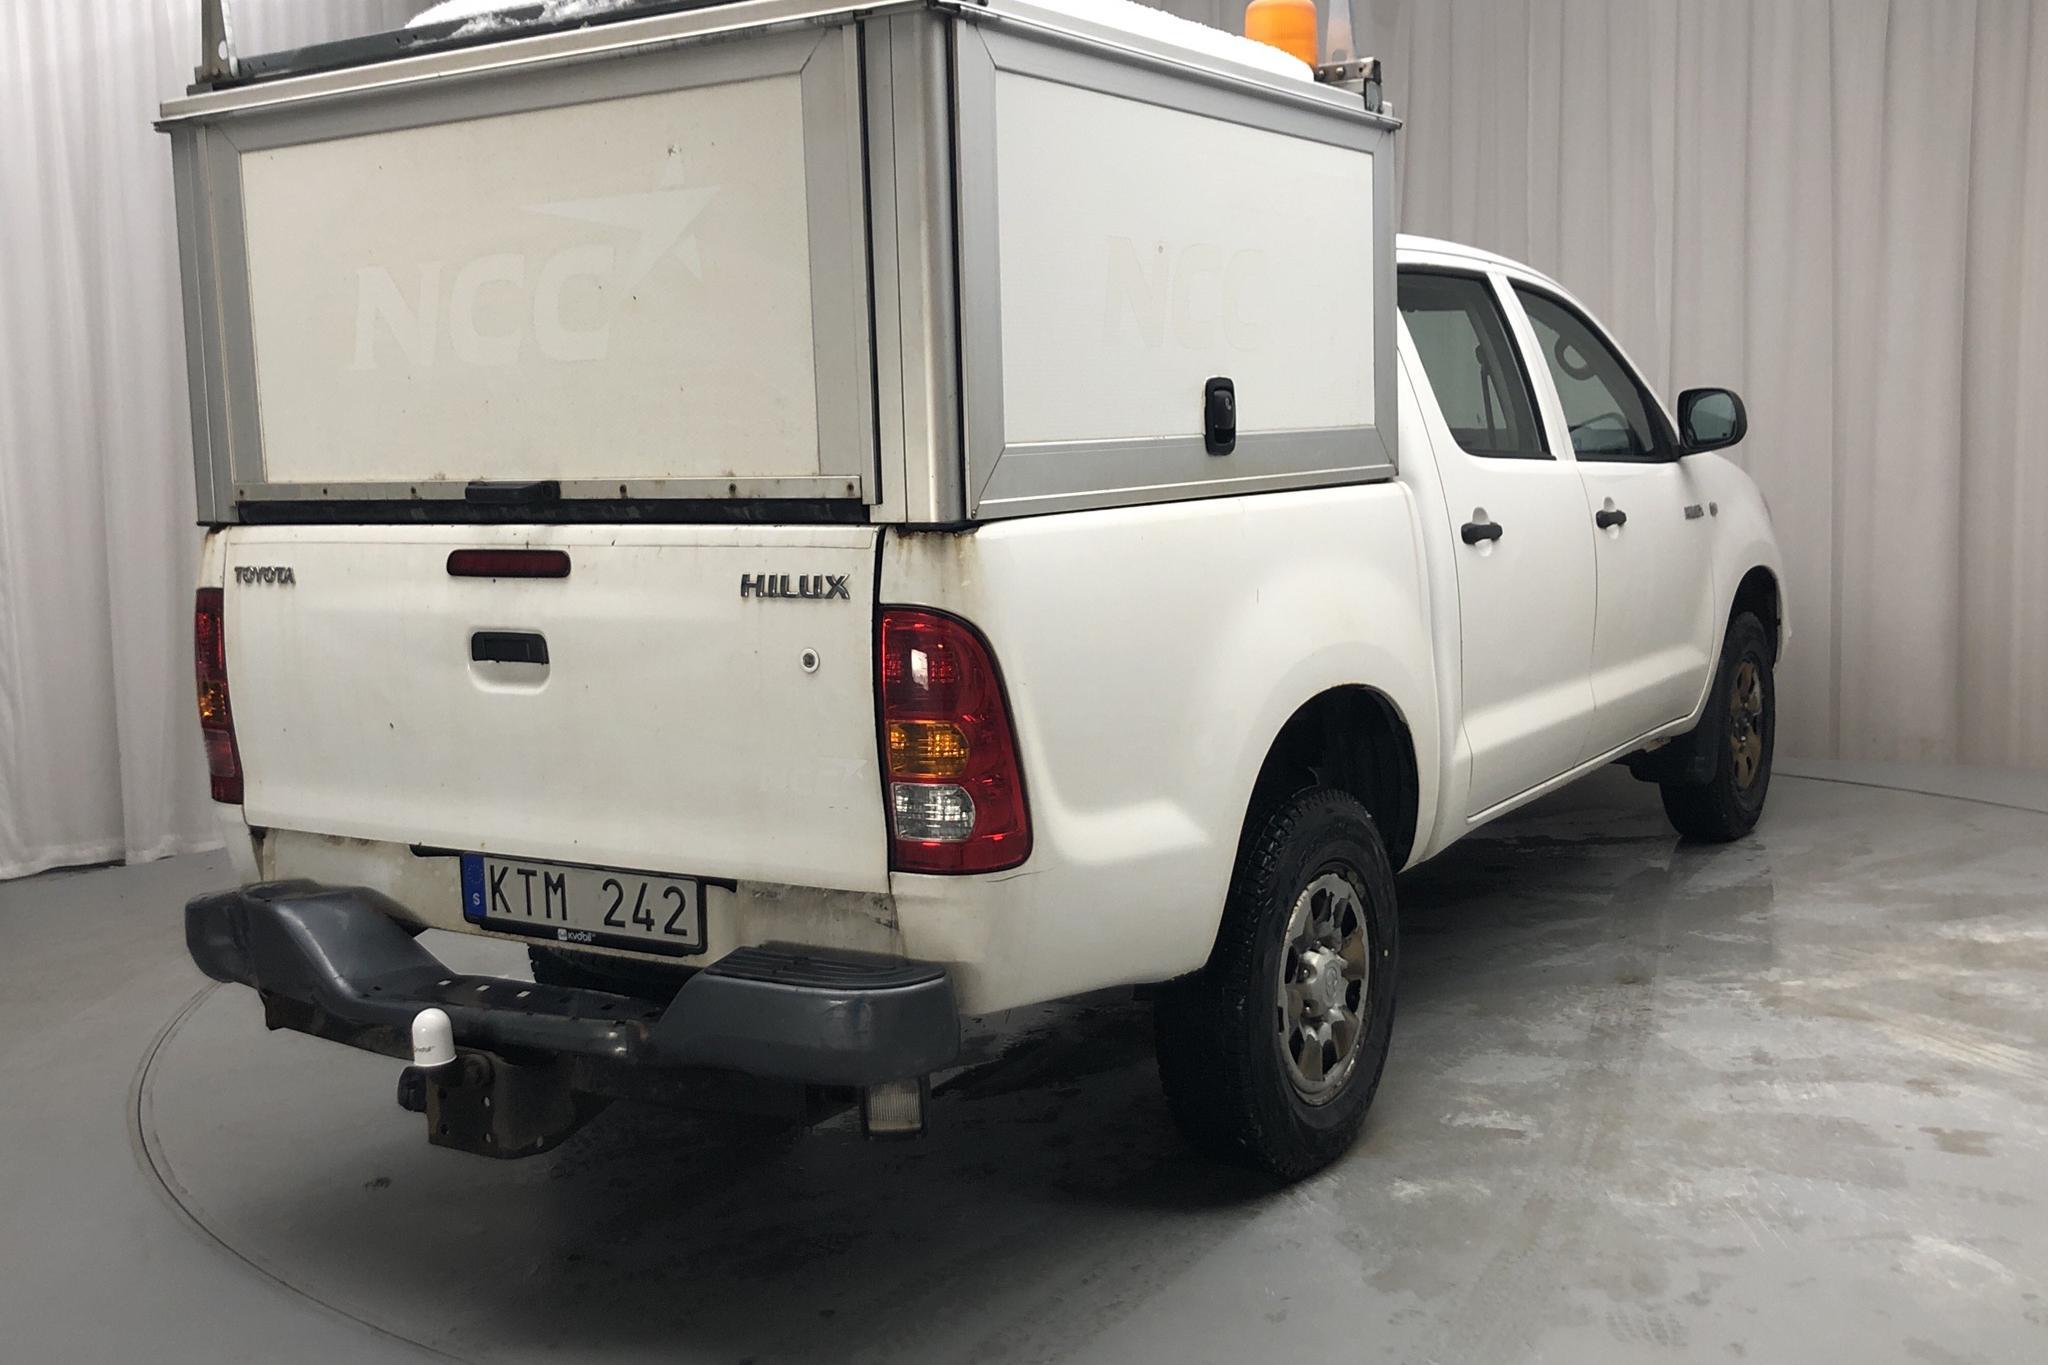 Toyota Hilux 2.5 D-4D 4WD (144hk) - 19 239 mil - Manuell - vit - 2010